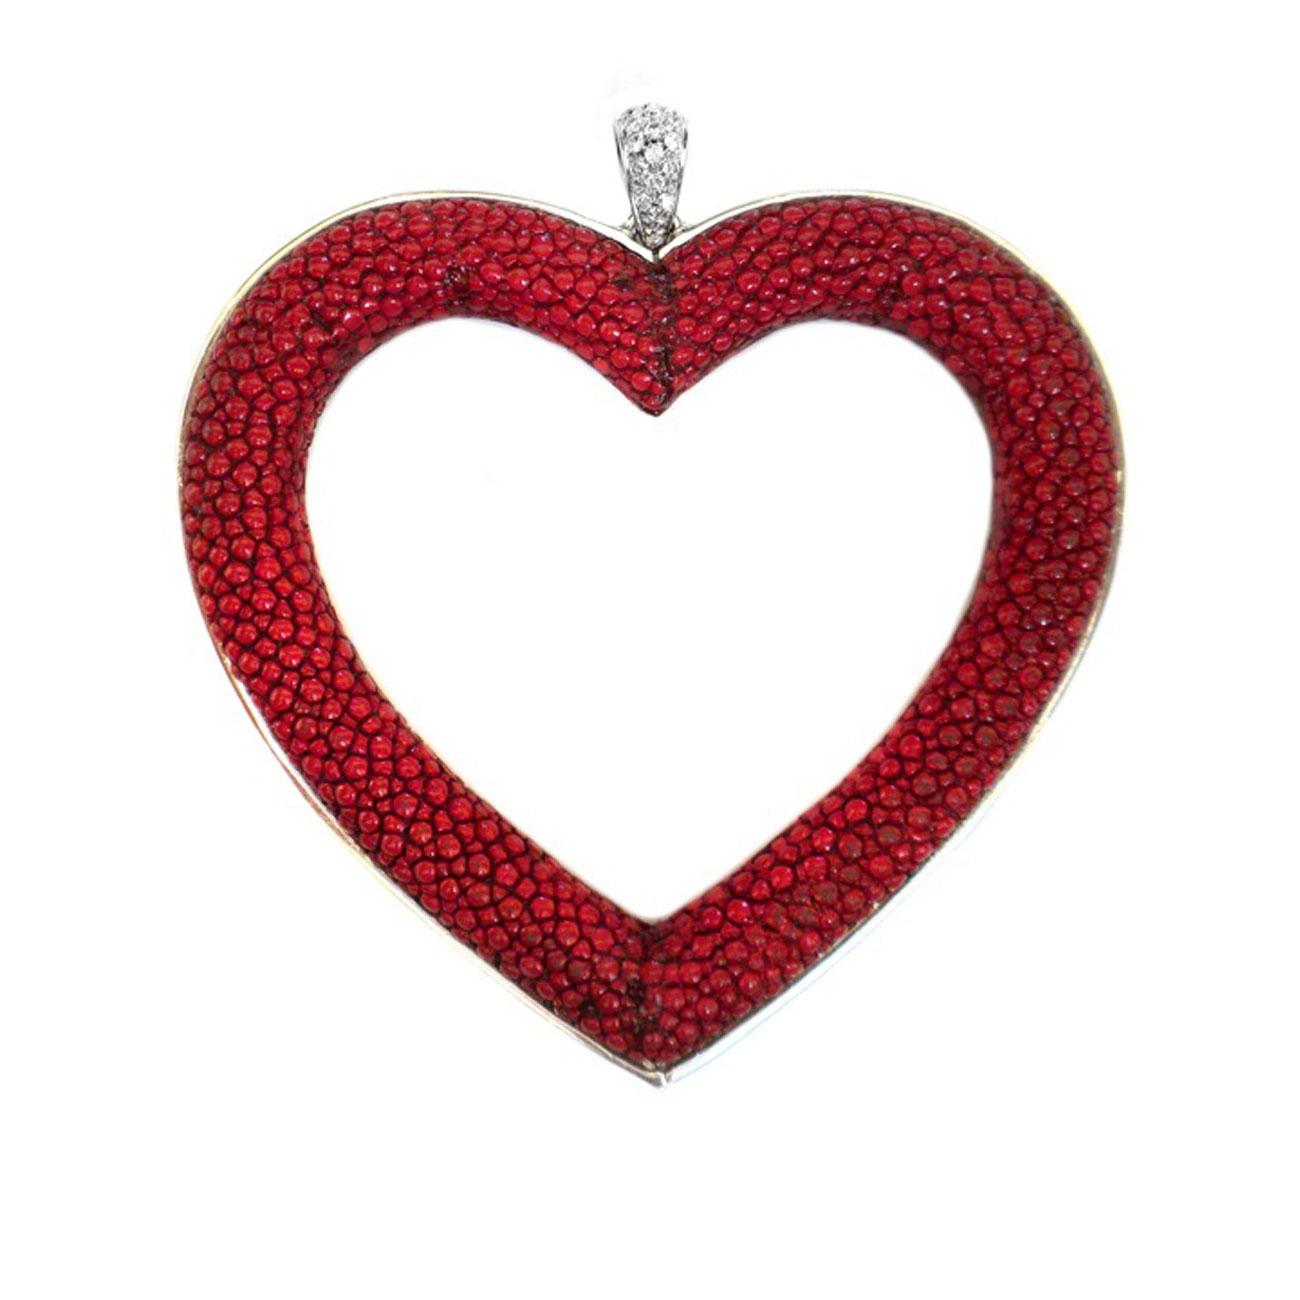 Cuore Rosso Maria Greca Sas Jewelry Made In Italy